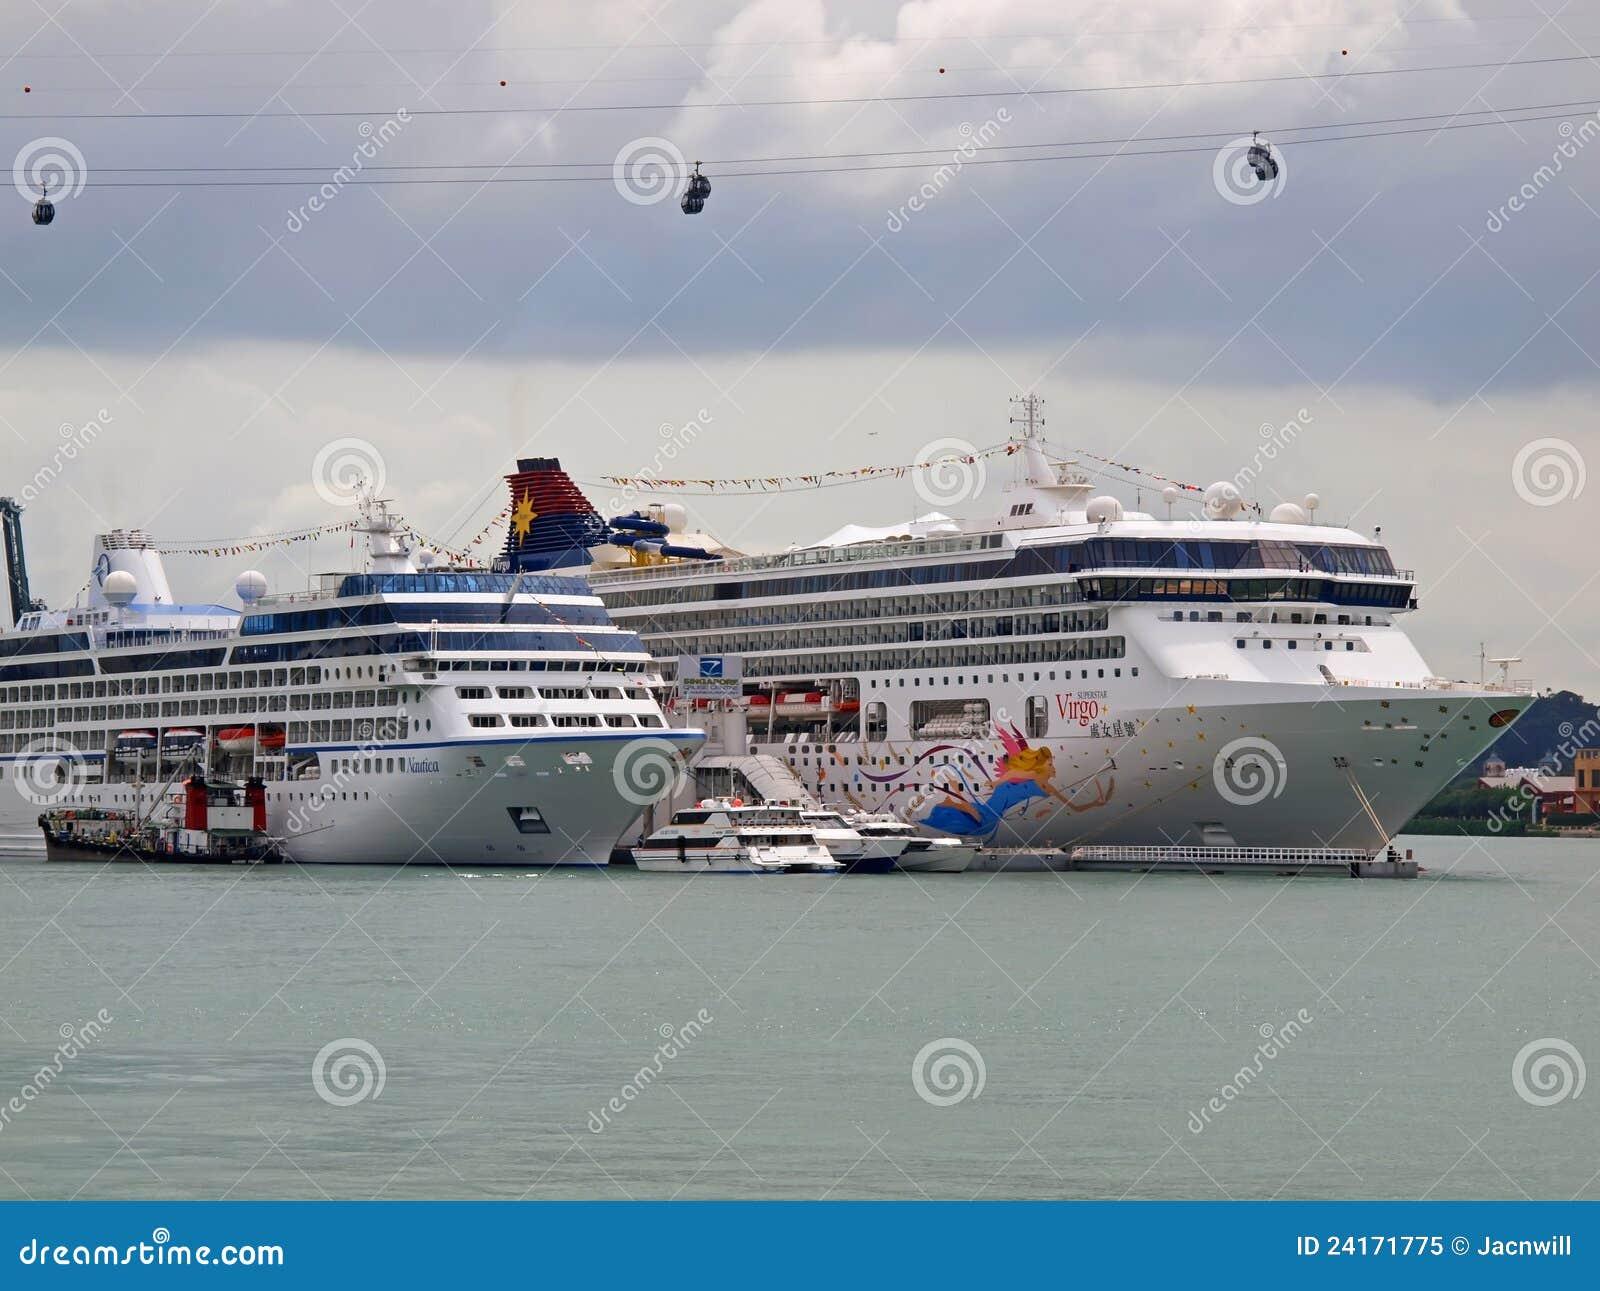 Star Cruises - SuperStar Virgo Review